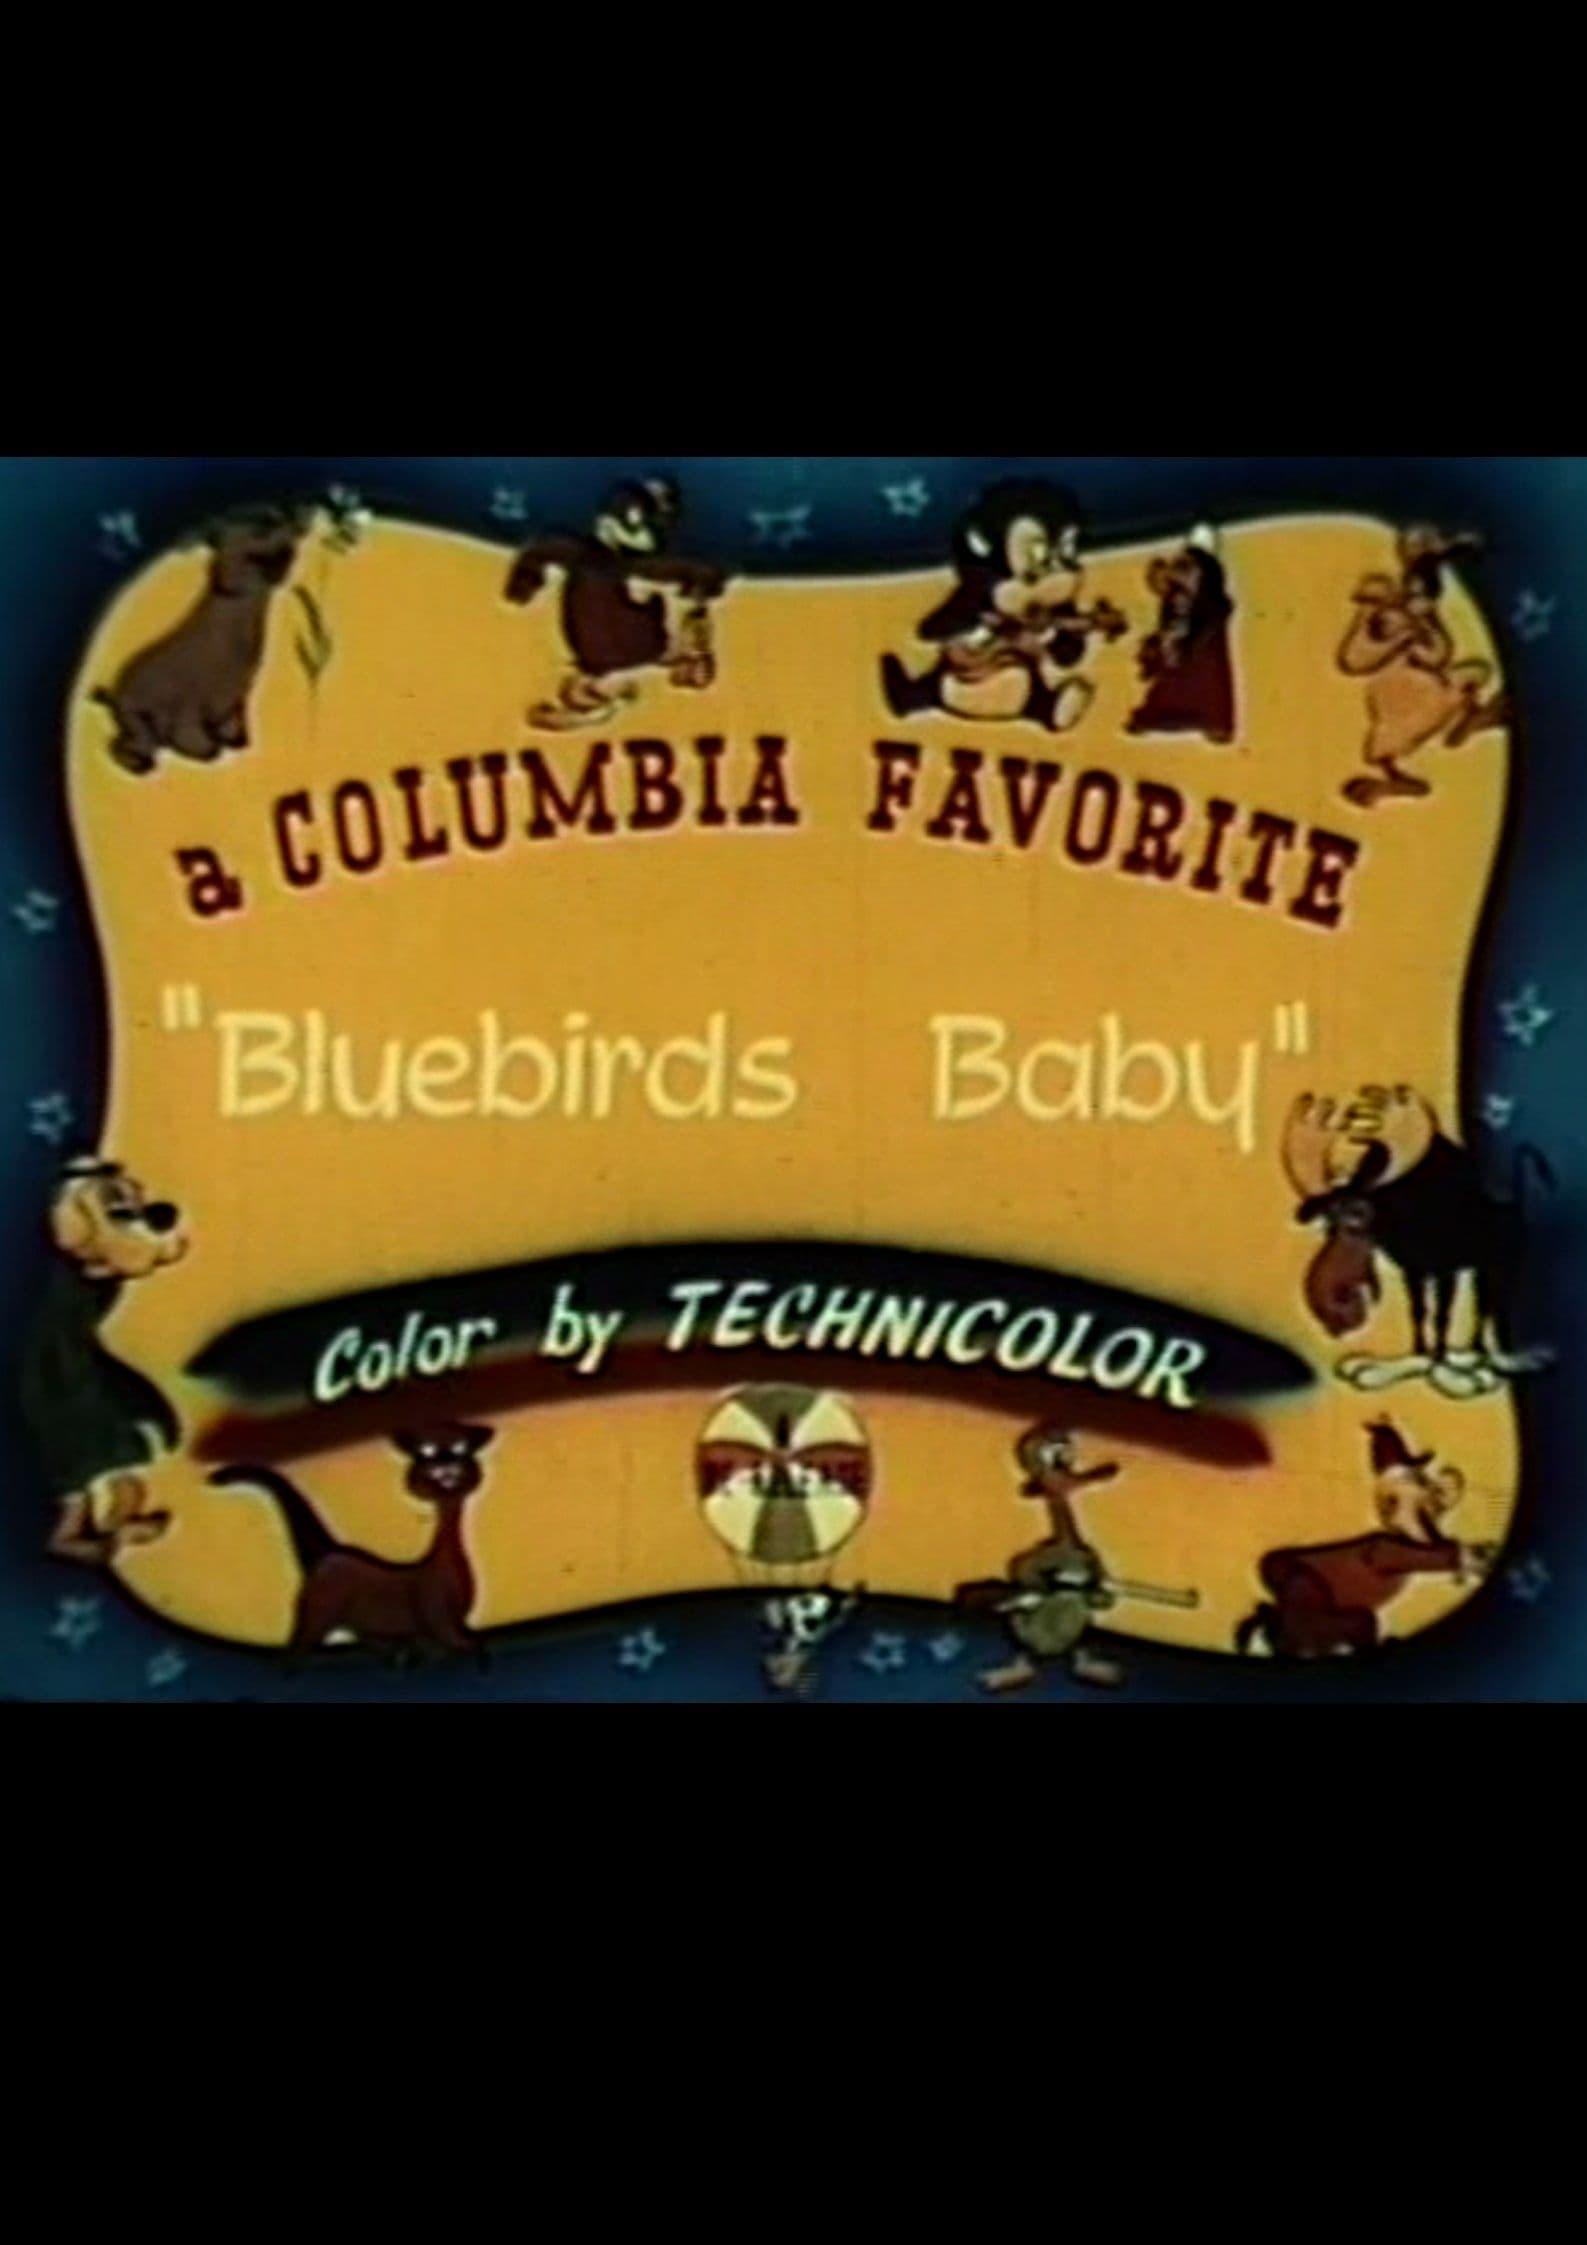 Bluebird's Baby